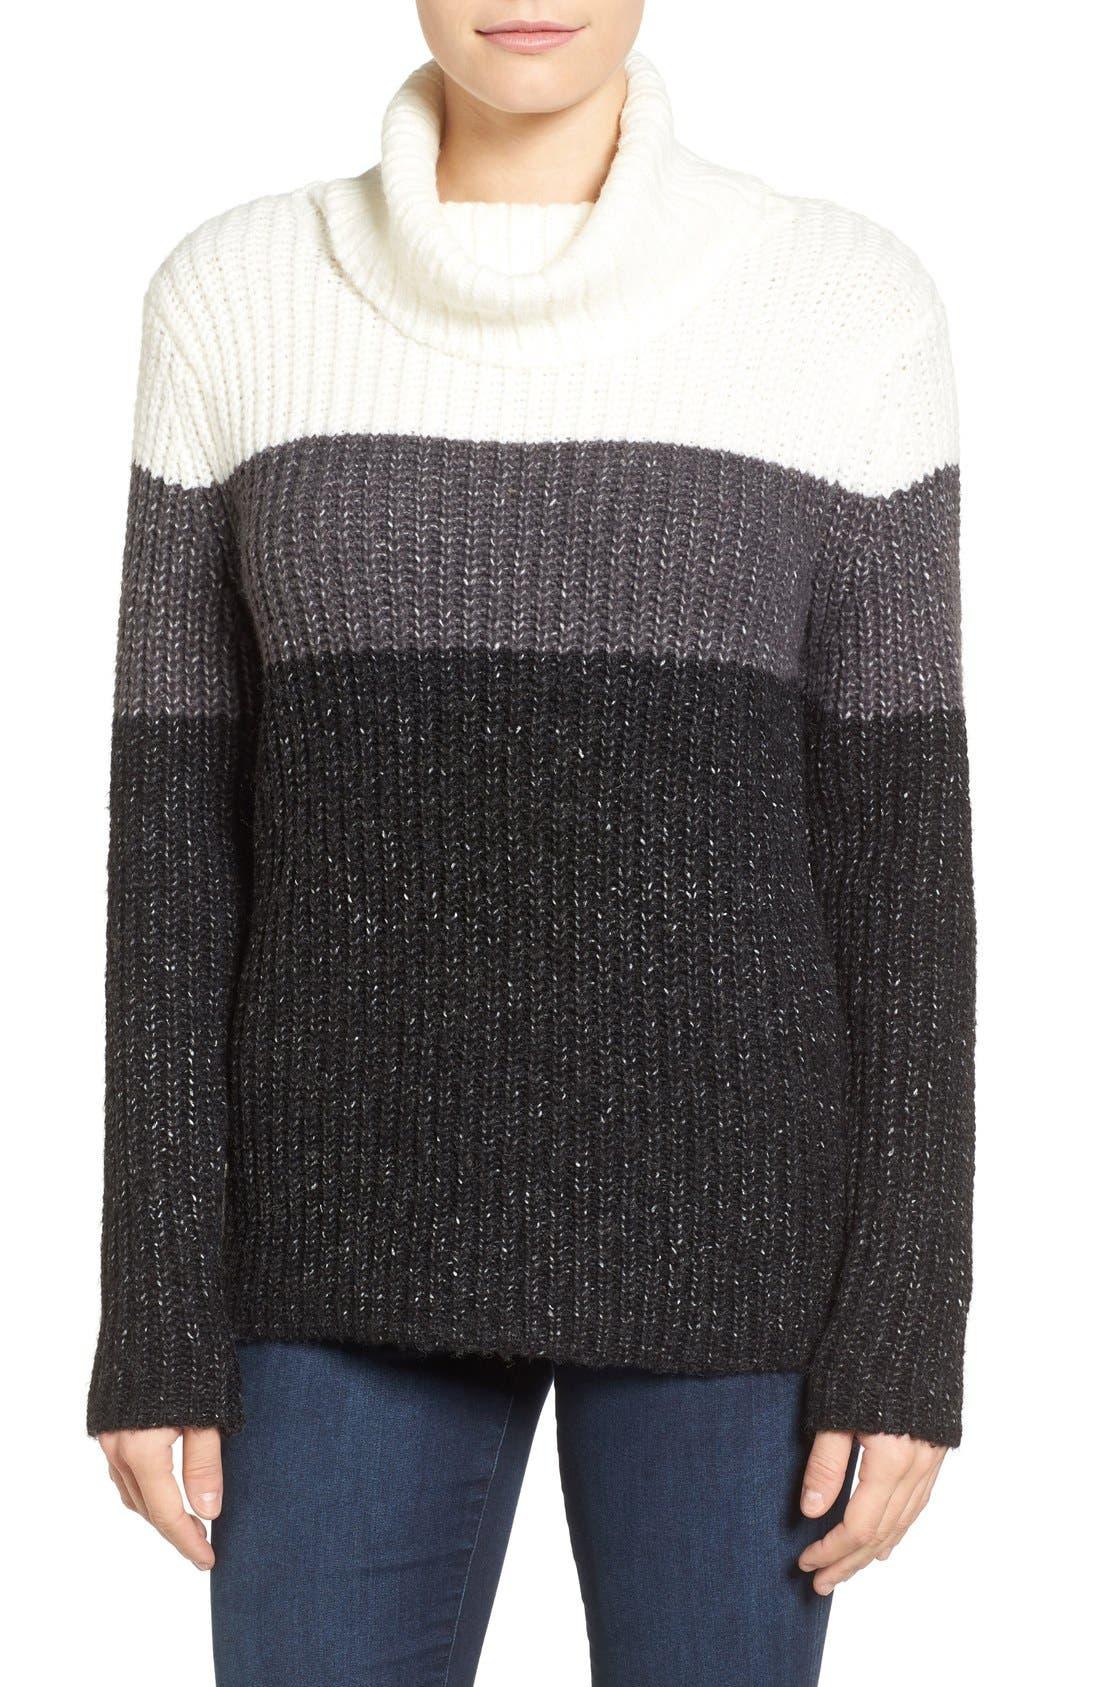 Alternate Image 1 Selected - Press Stripe Knit Turtleneck Sweater